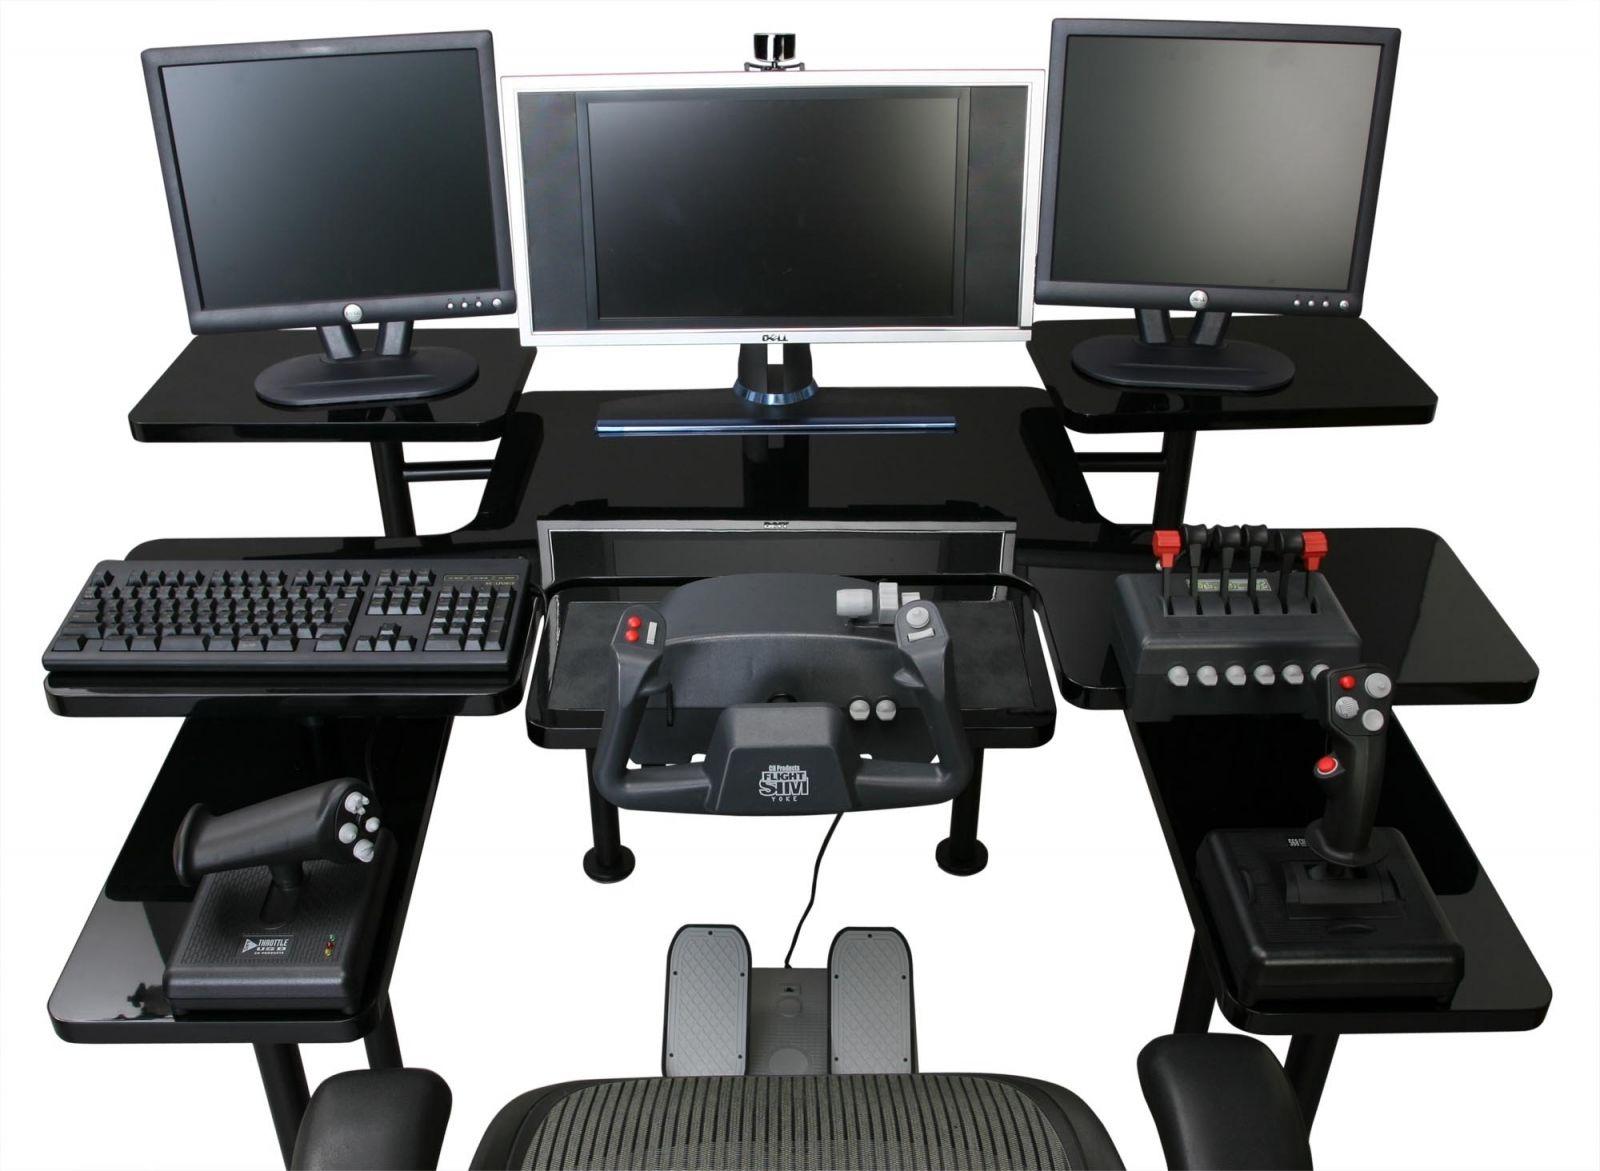 Best Custom Gaming Desk Setup With Multiple Monitors In Black Gaming Computer Desk Custom Gaming Computer Computer Room